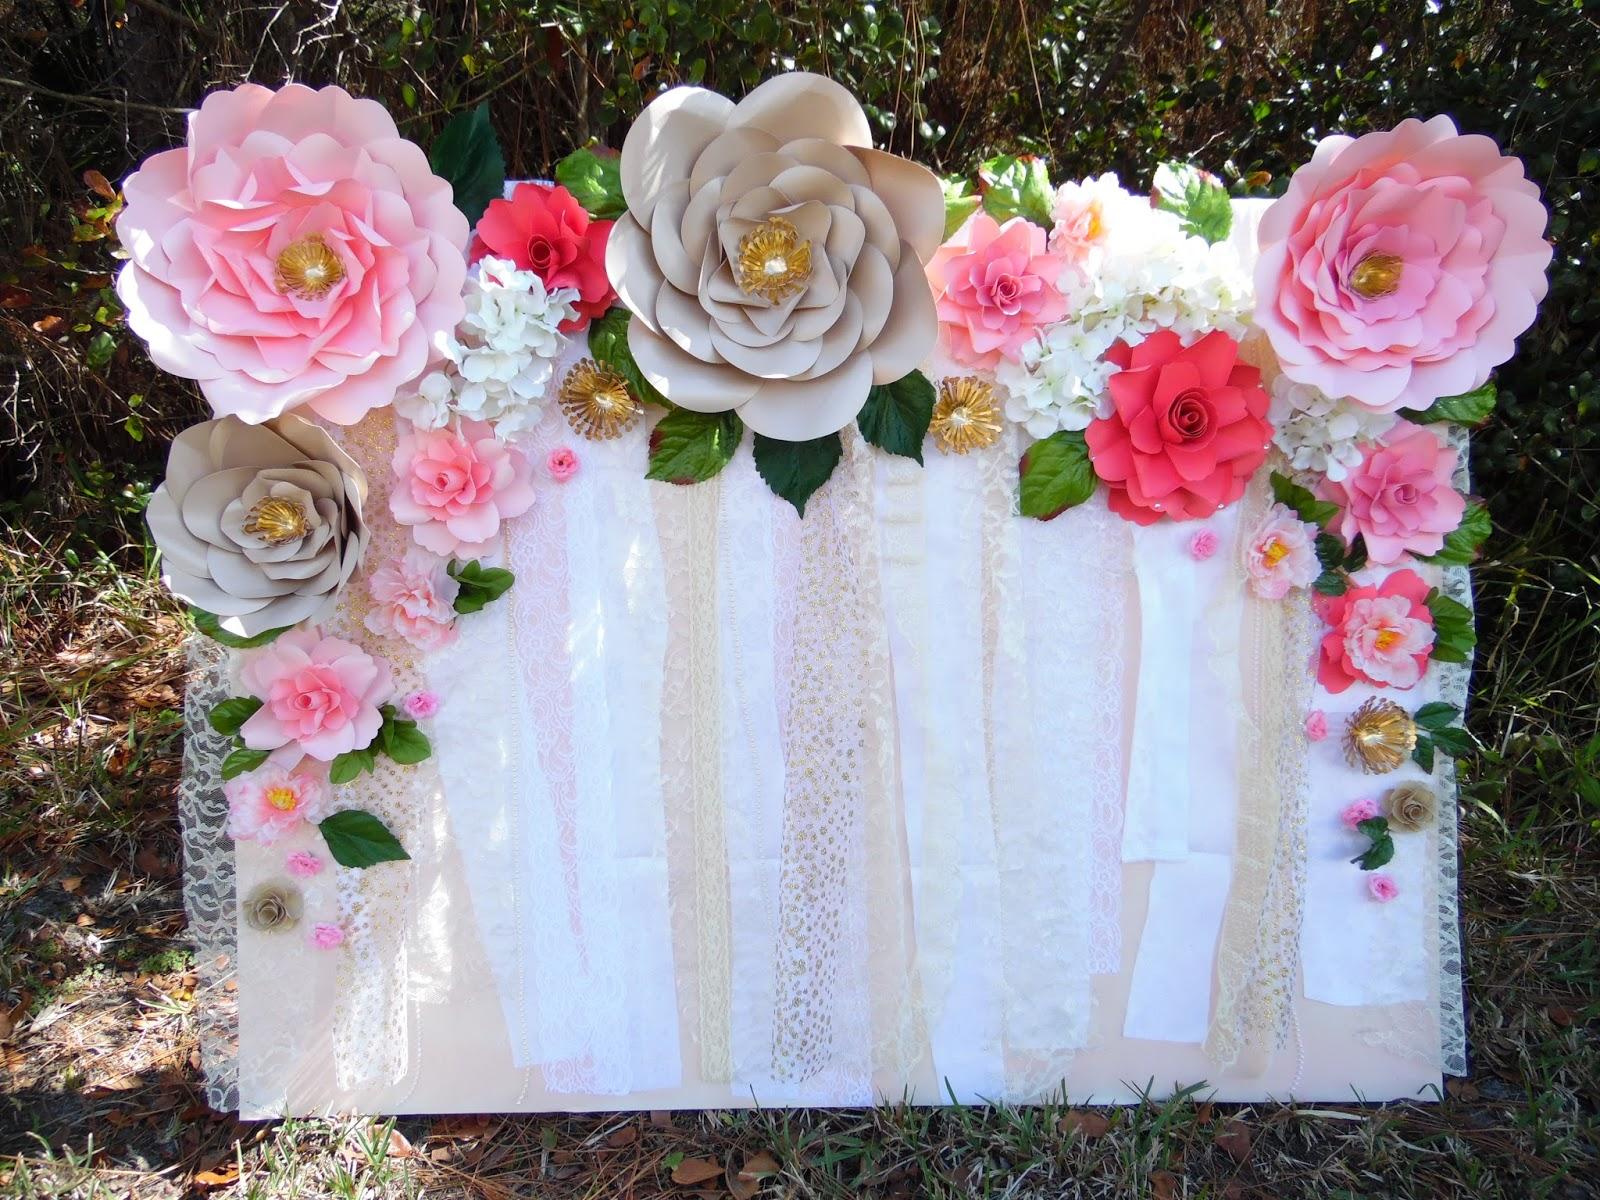 Paper Flower Photo Booth Antalexpolicenciaslatam